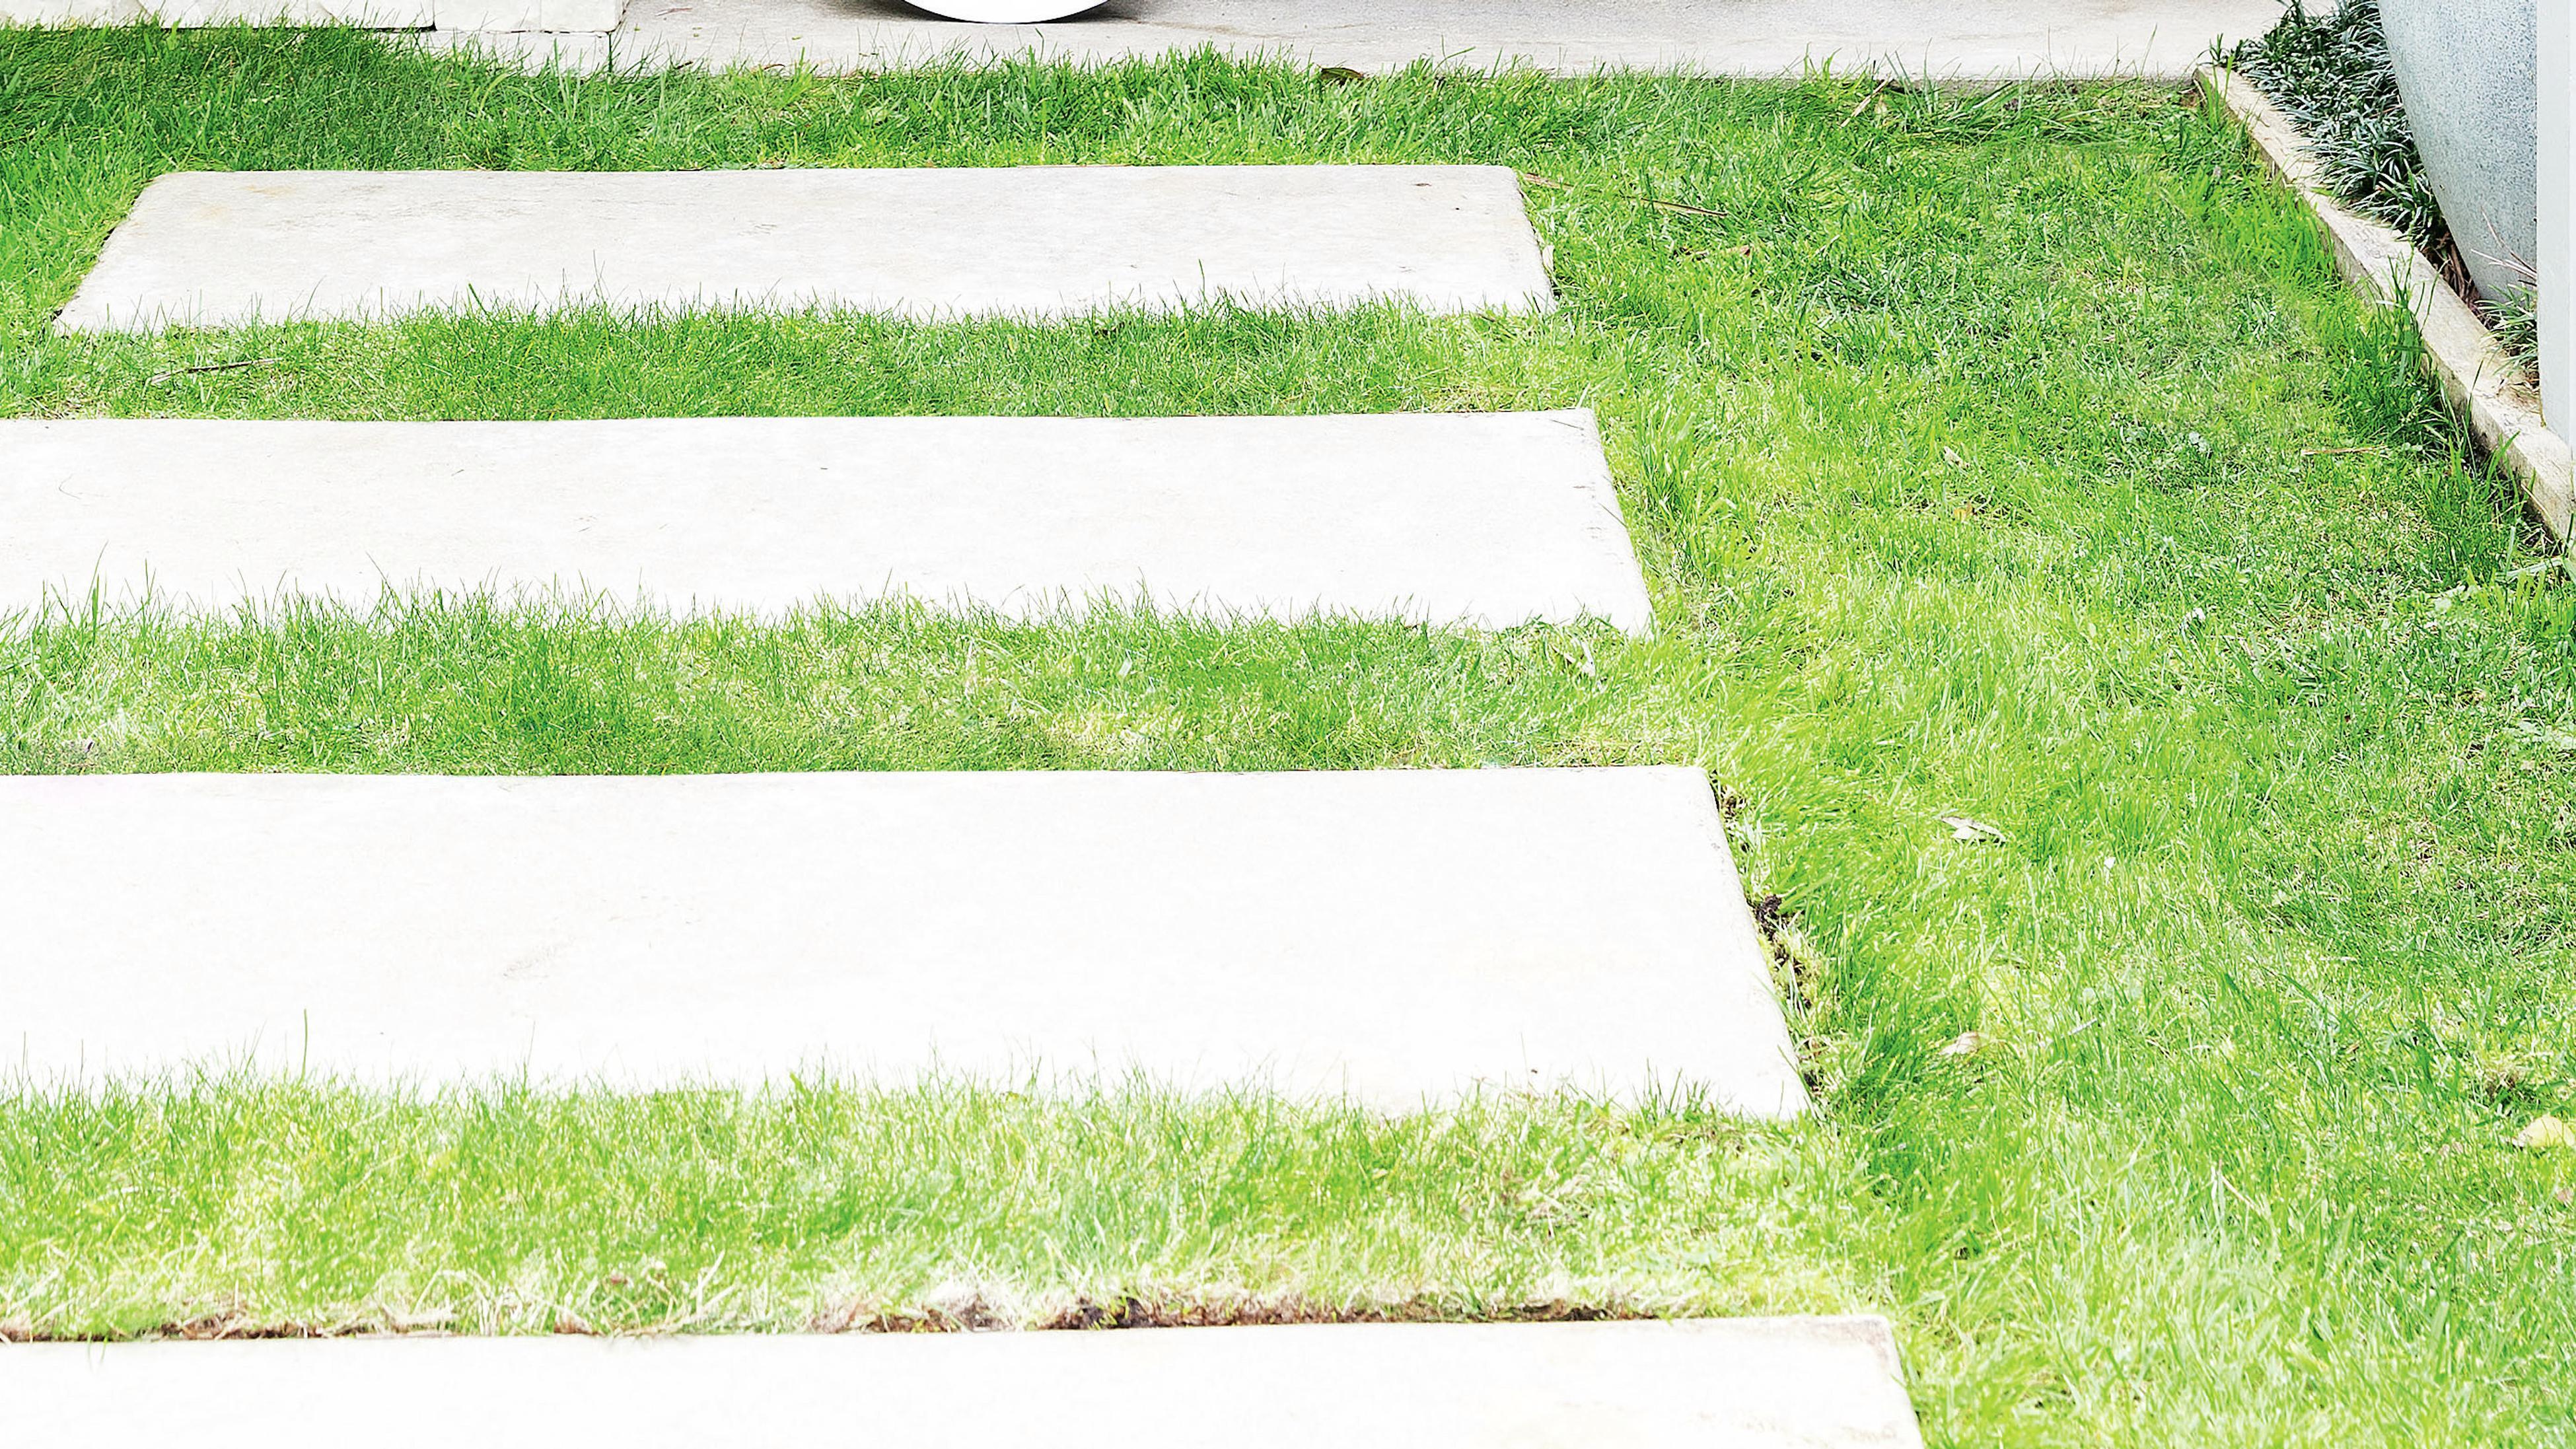 Concrete pavers set into a lawn.